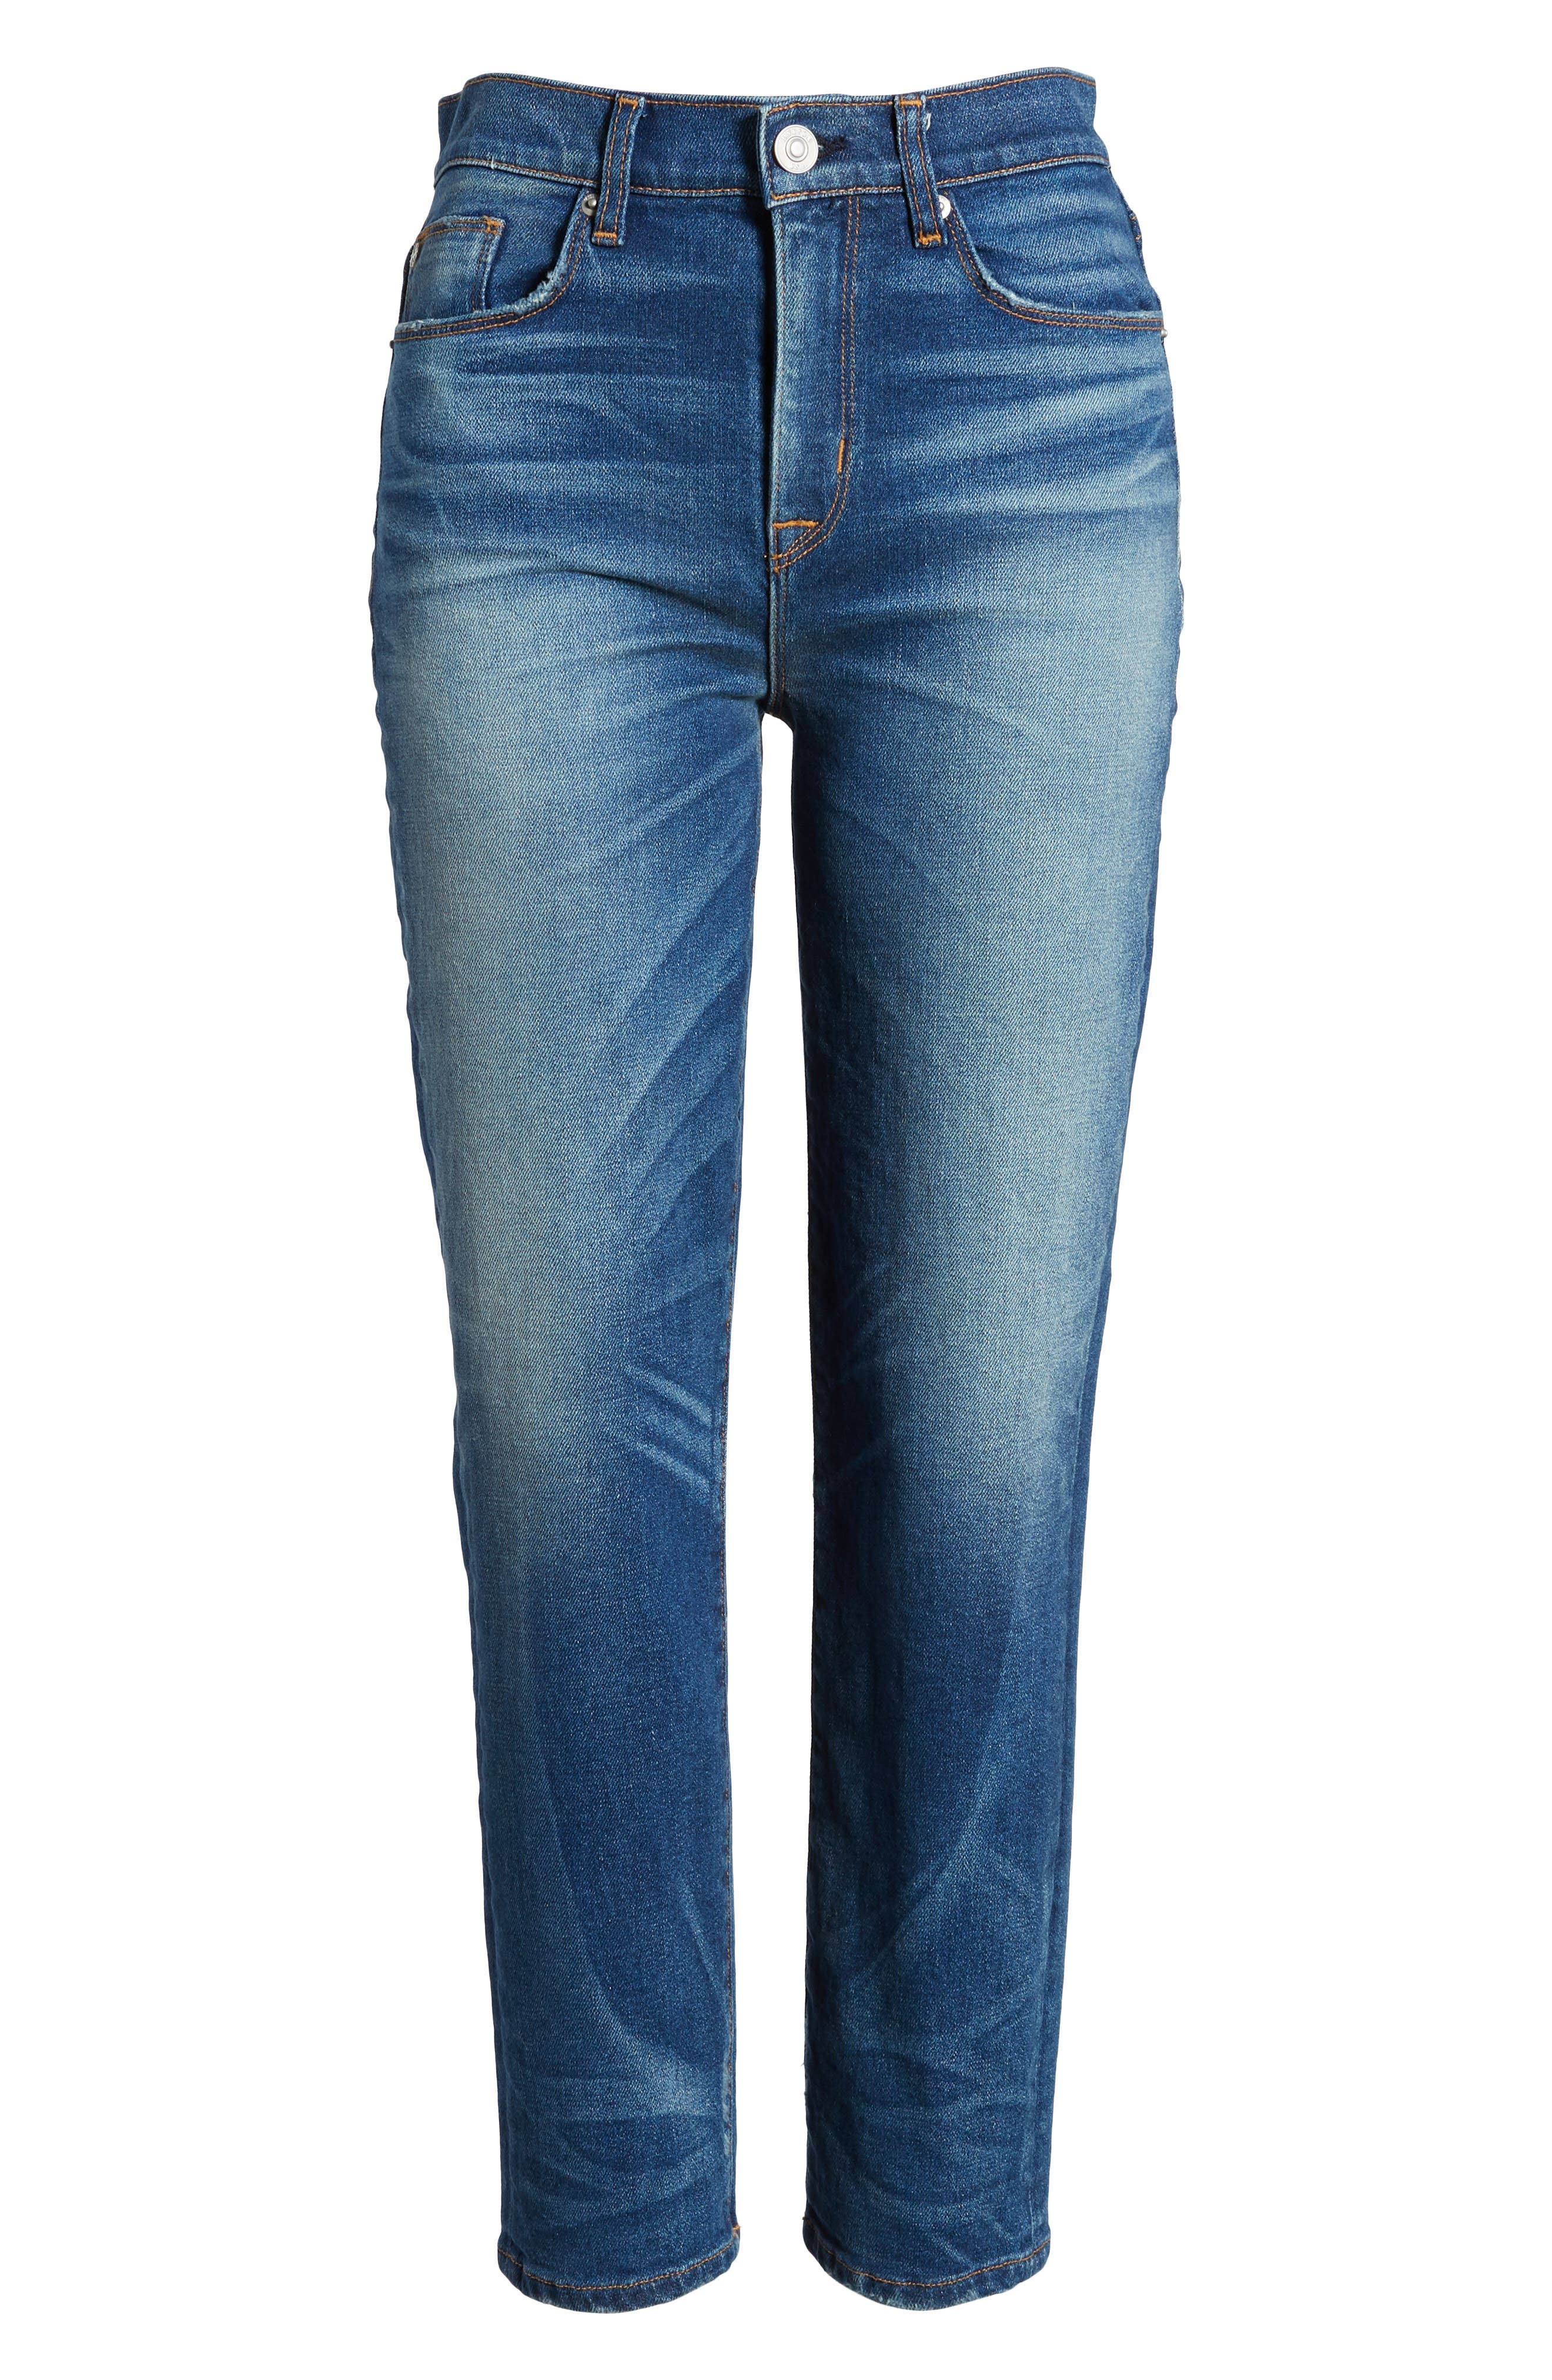 Zoeey High Waist Crop Straight Leg Jeans,                             Alternate thumbnail 7, color,                             420